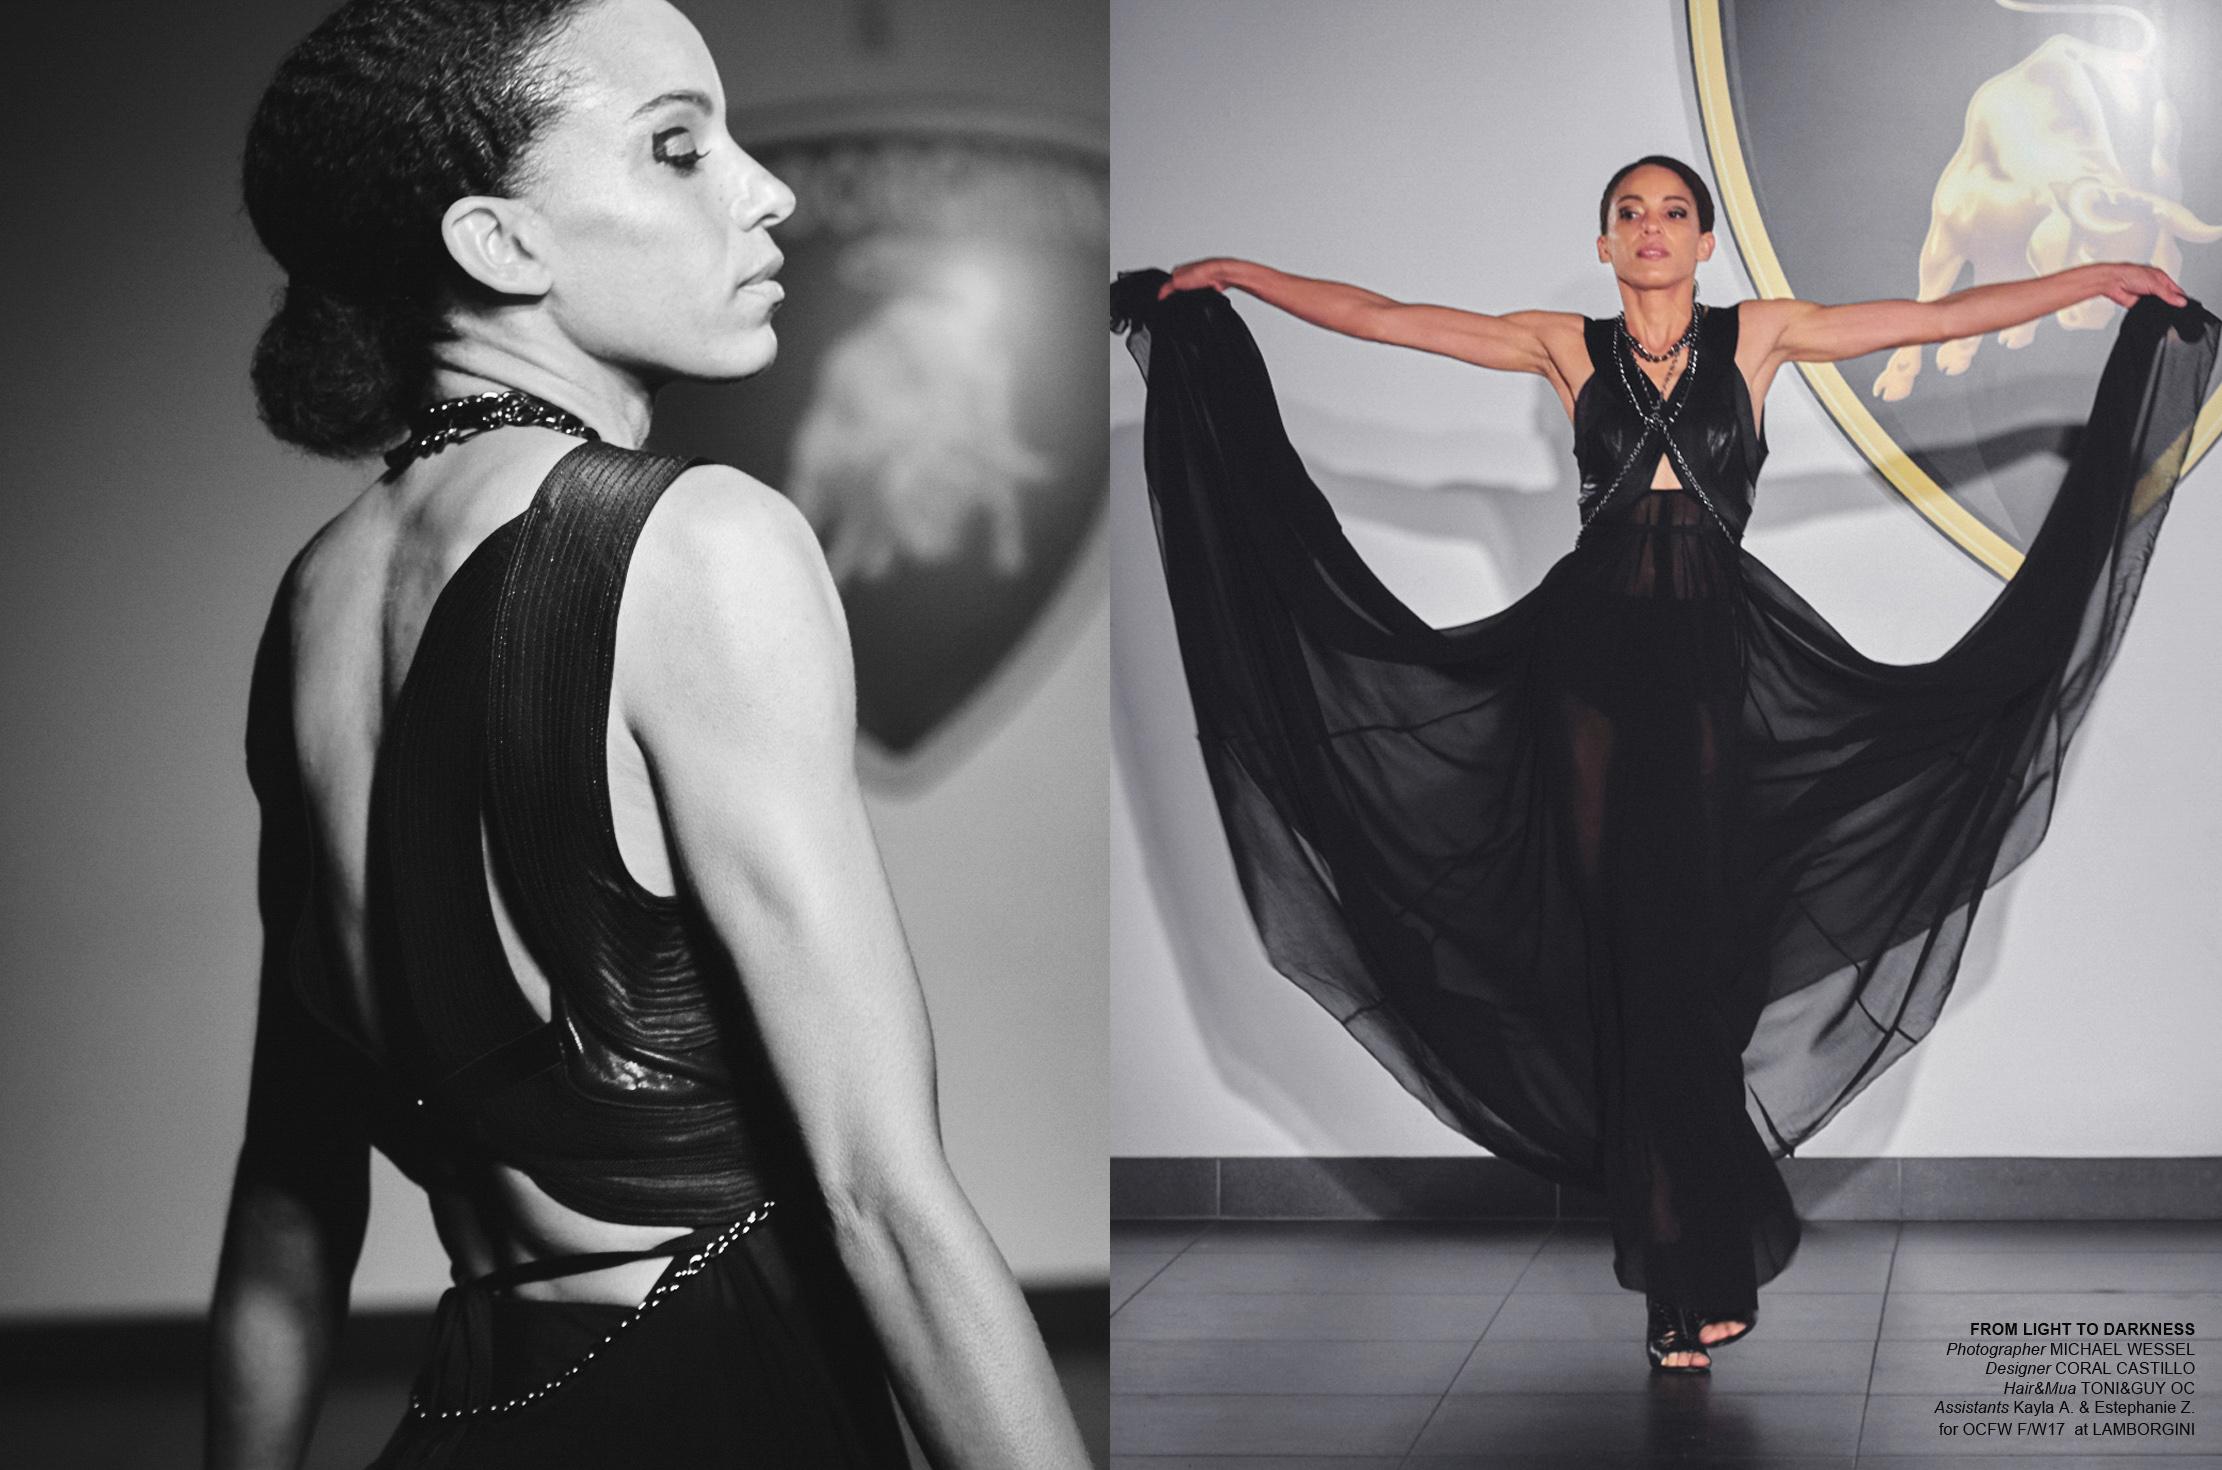 Coral Castillo - OC Fashion Week March 2017 - Photos by Michael Wessel & cREAtive Castle Studios (www.creativecastlestudios.com-Coral-Castillo and www.creativecastlestudios.com-michael-wessel) 1.jpg